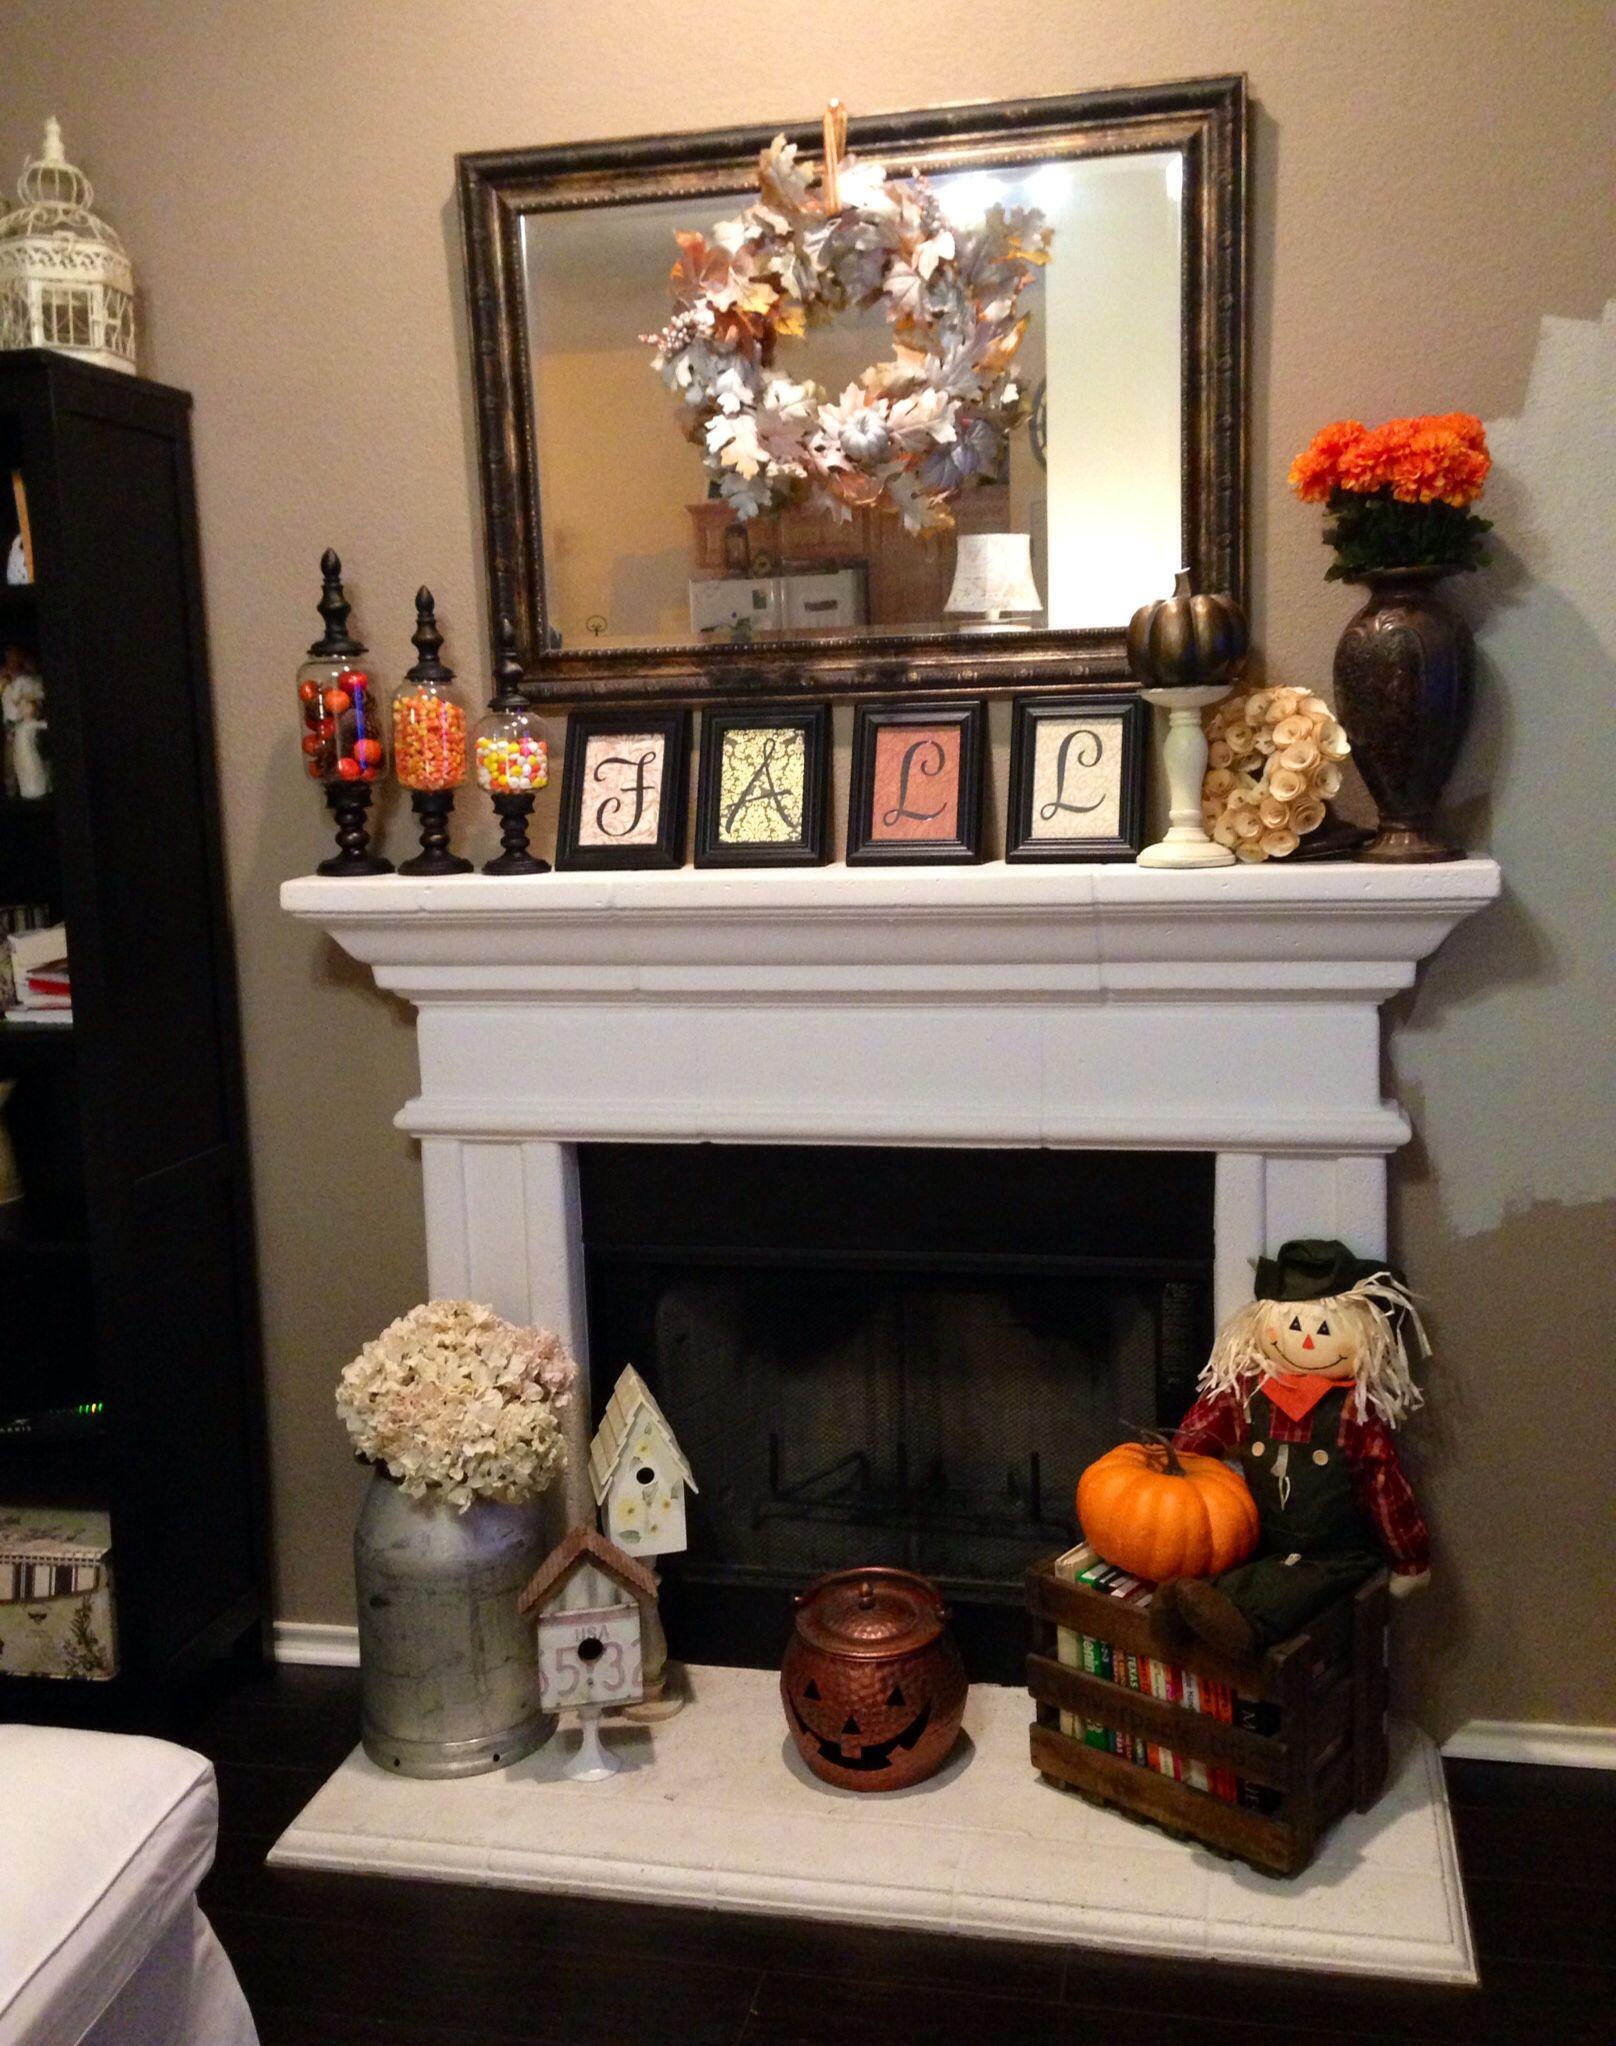 mantelpiece fireplace mantel decorating for decor home gas room designs ideas inside interiors living decoration